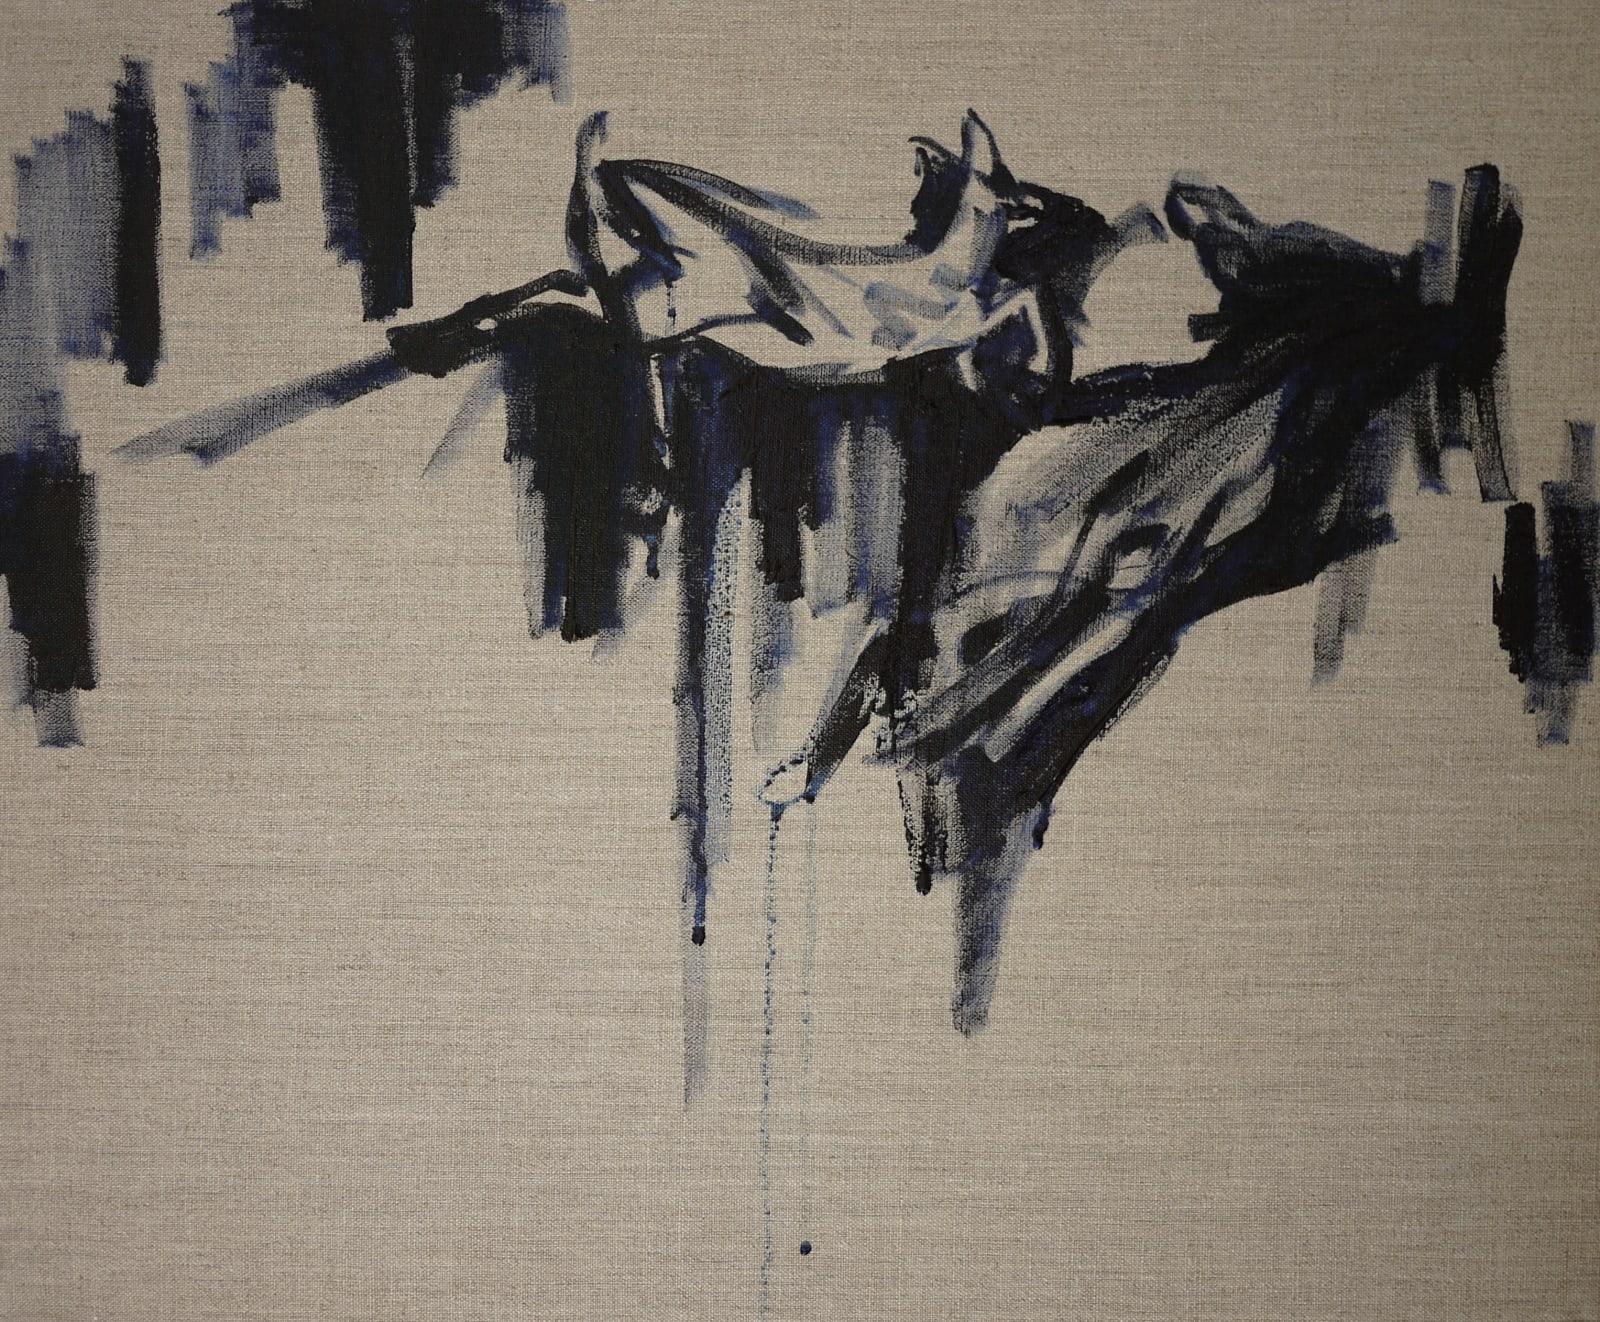 Elizabeth Schwaiger, Blue Deer Jump, 2013